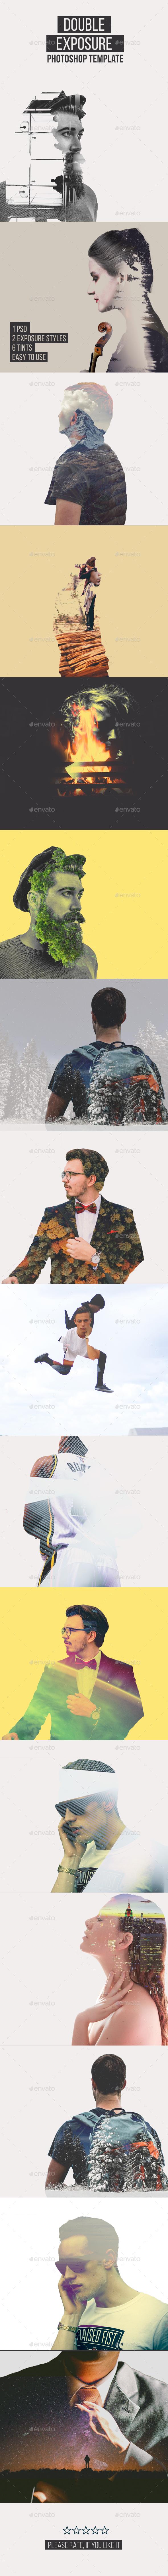 Double Exposure Template - Artistic Photo Templates